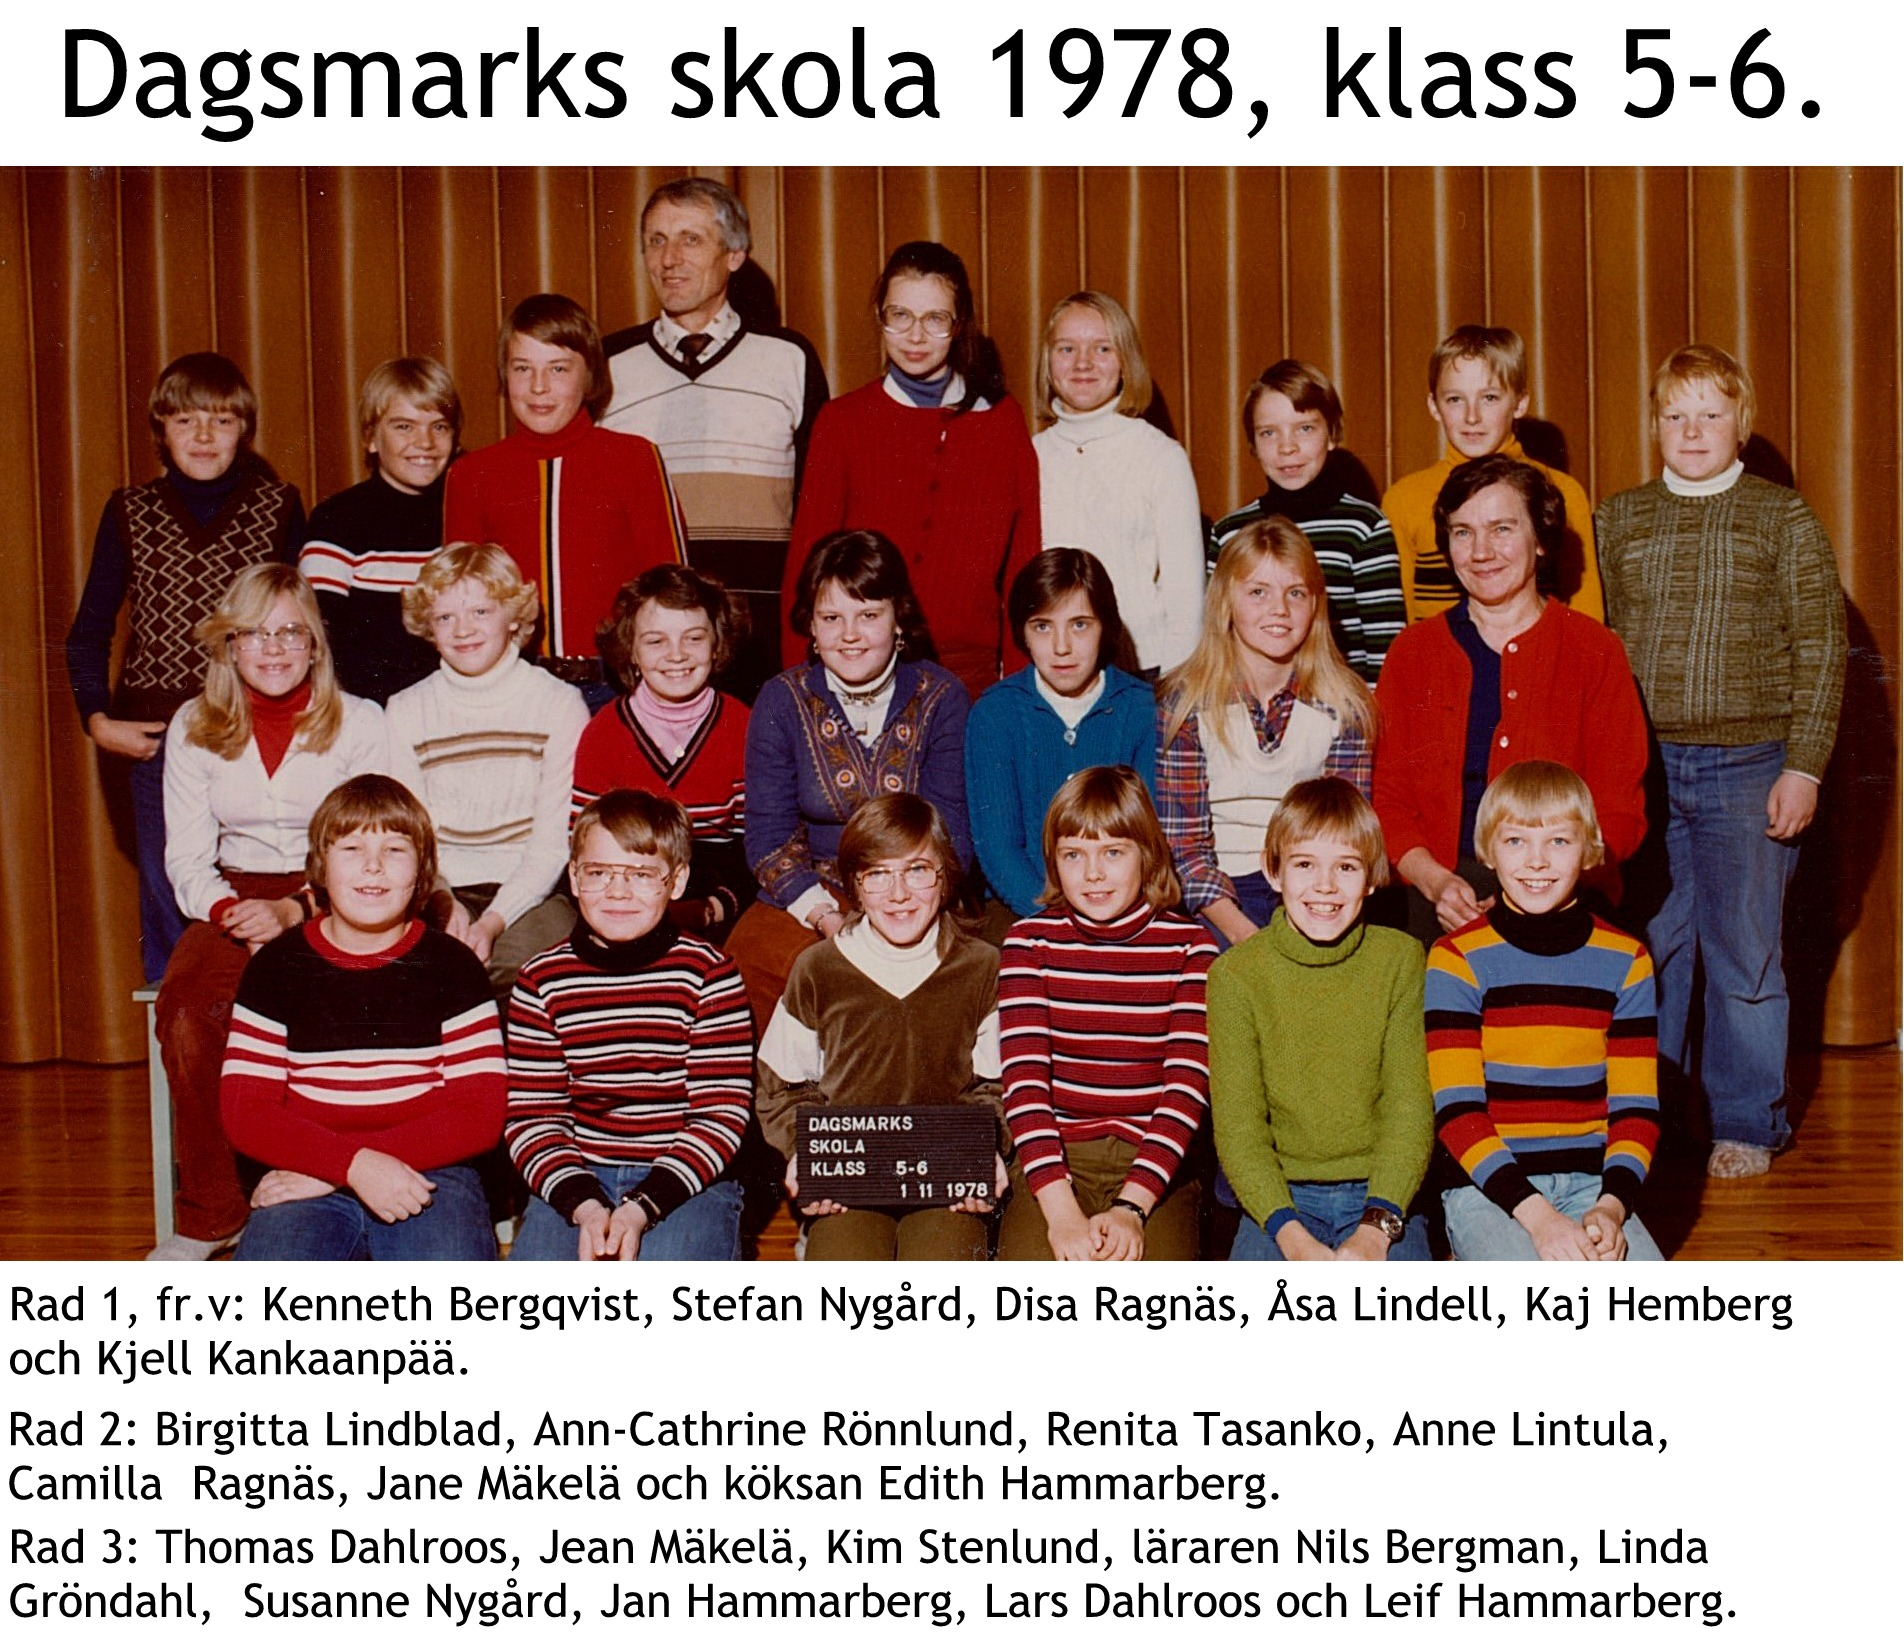 1978 Dagsmark skola klasserna 5-6